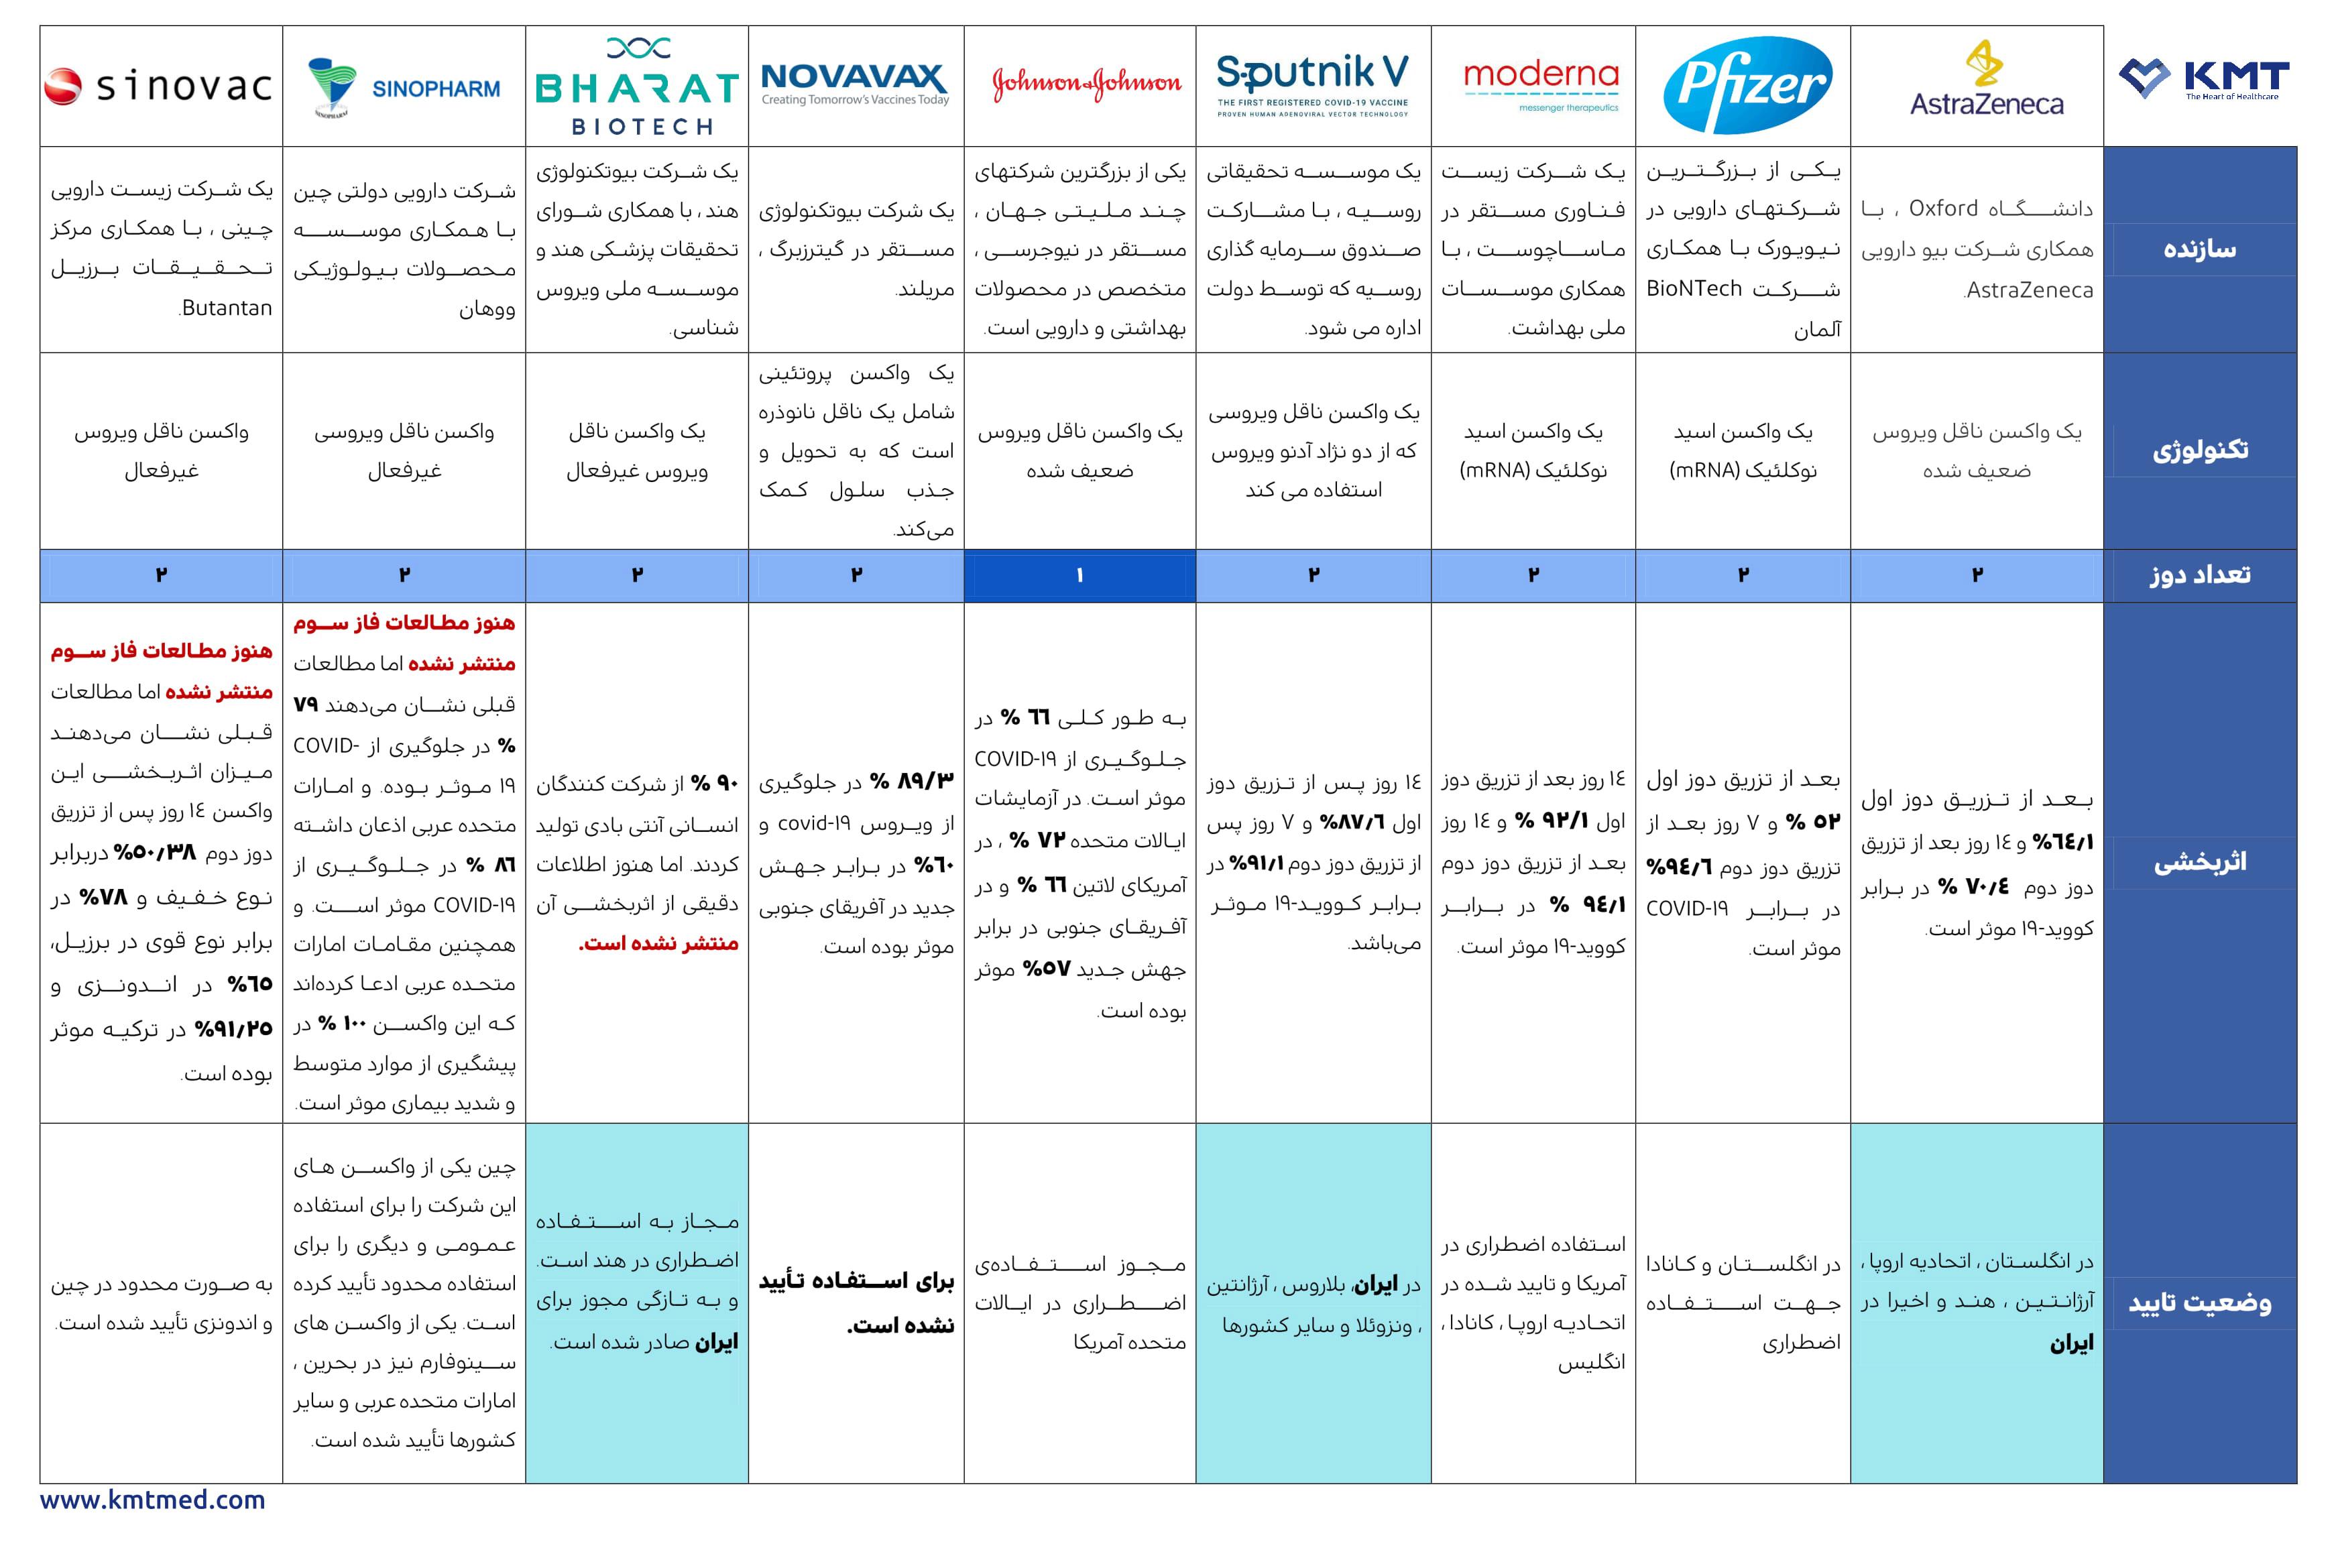 Vaccines Table-KMT.jpg